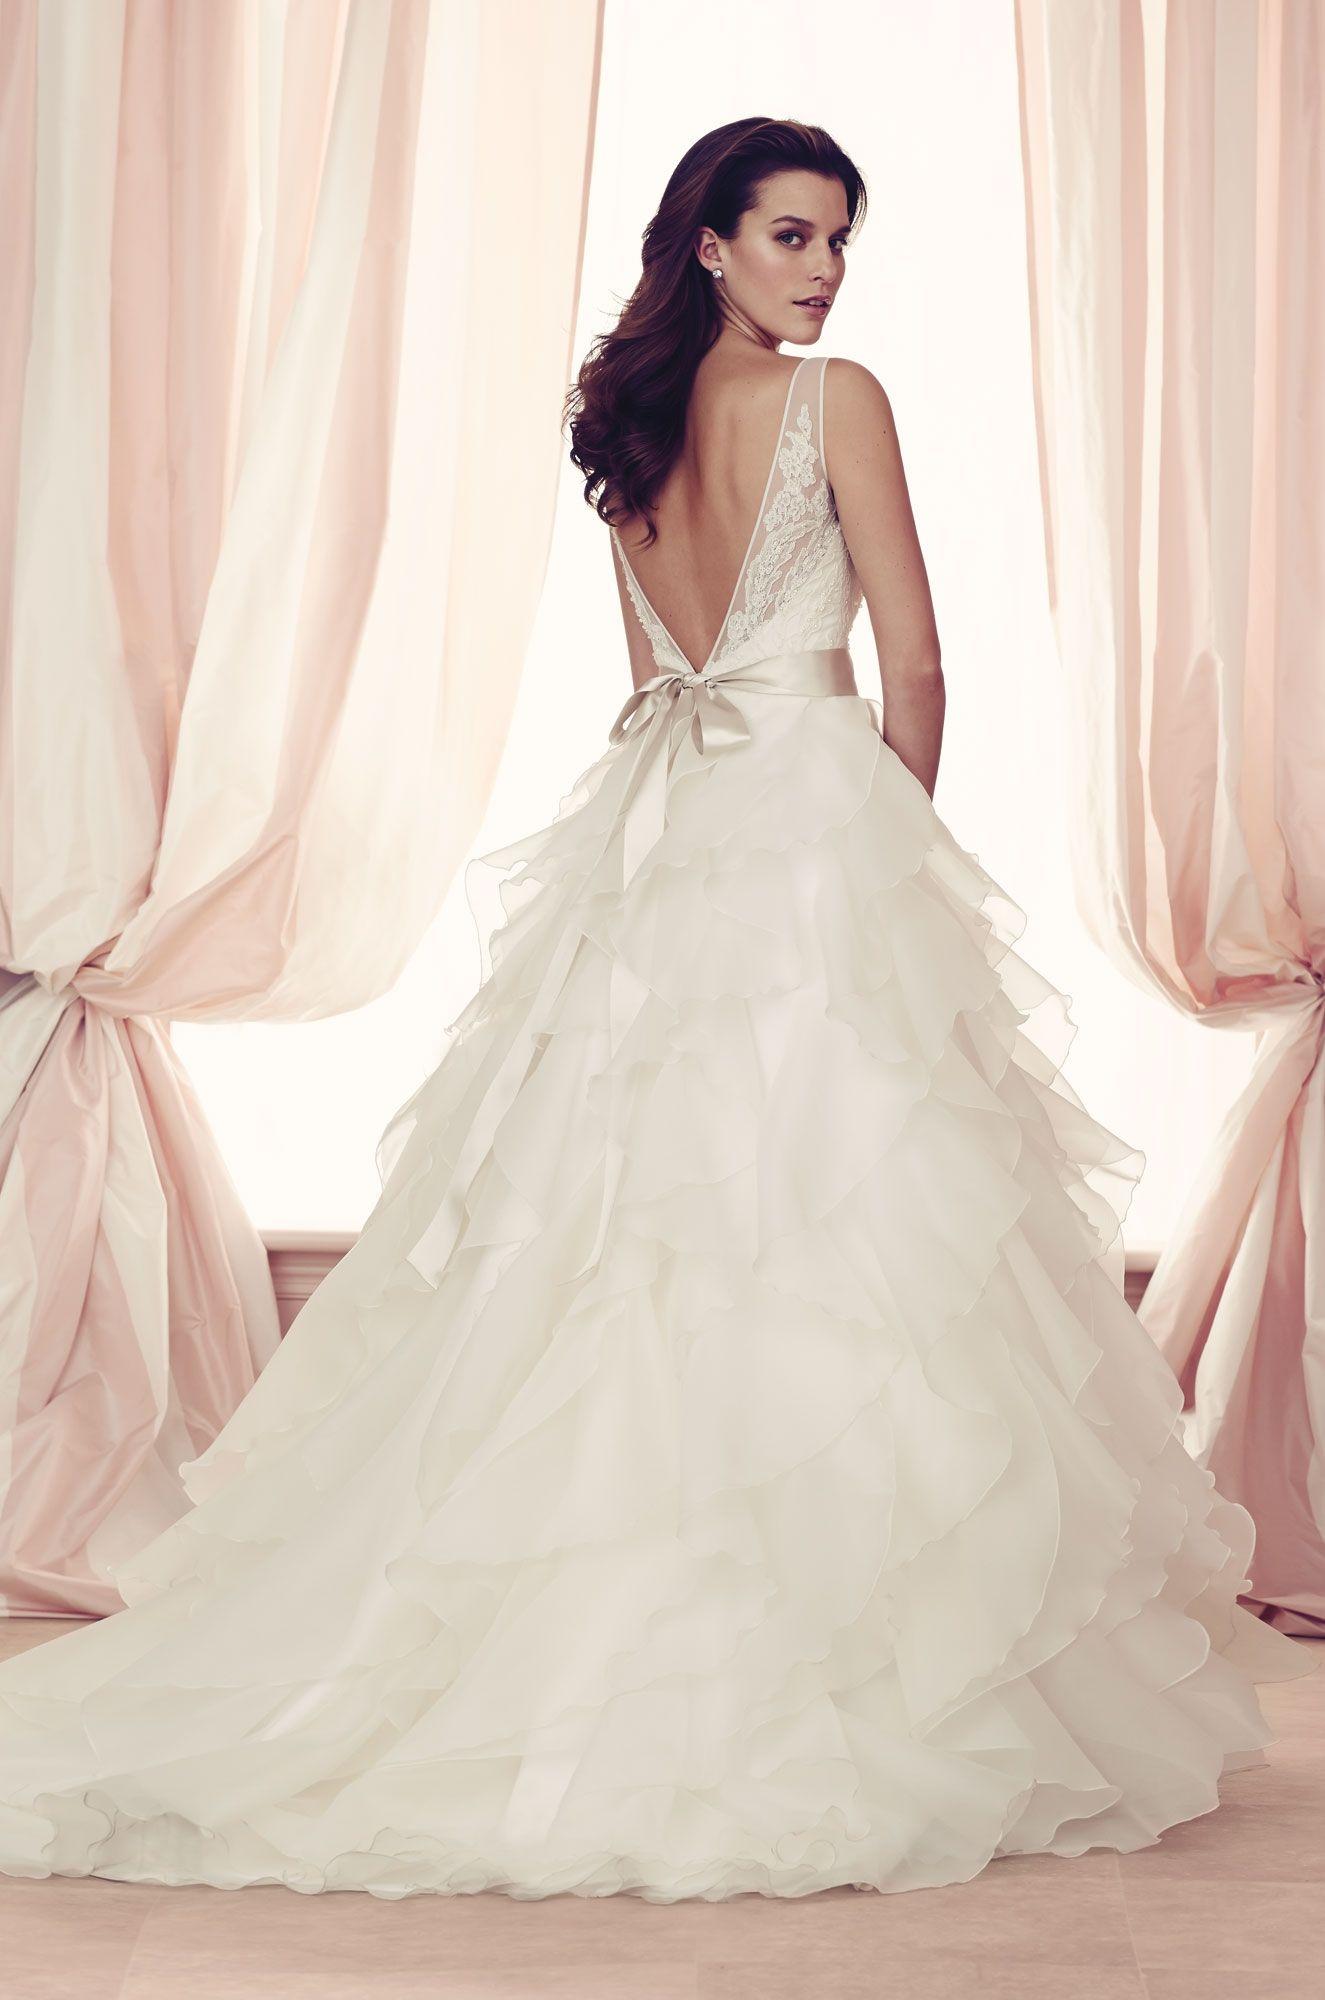 Palomablancawed french alençon lace and organdy wedding dress back